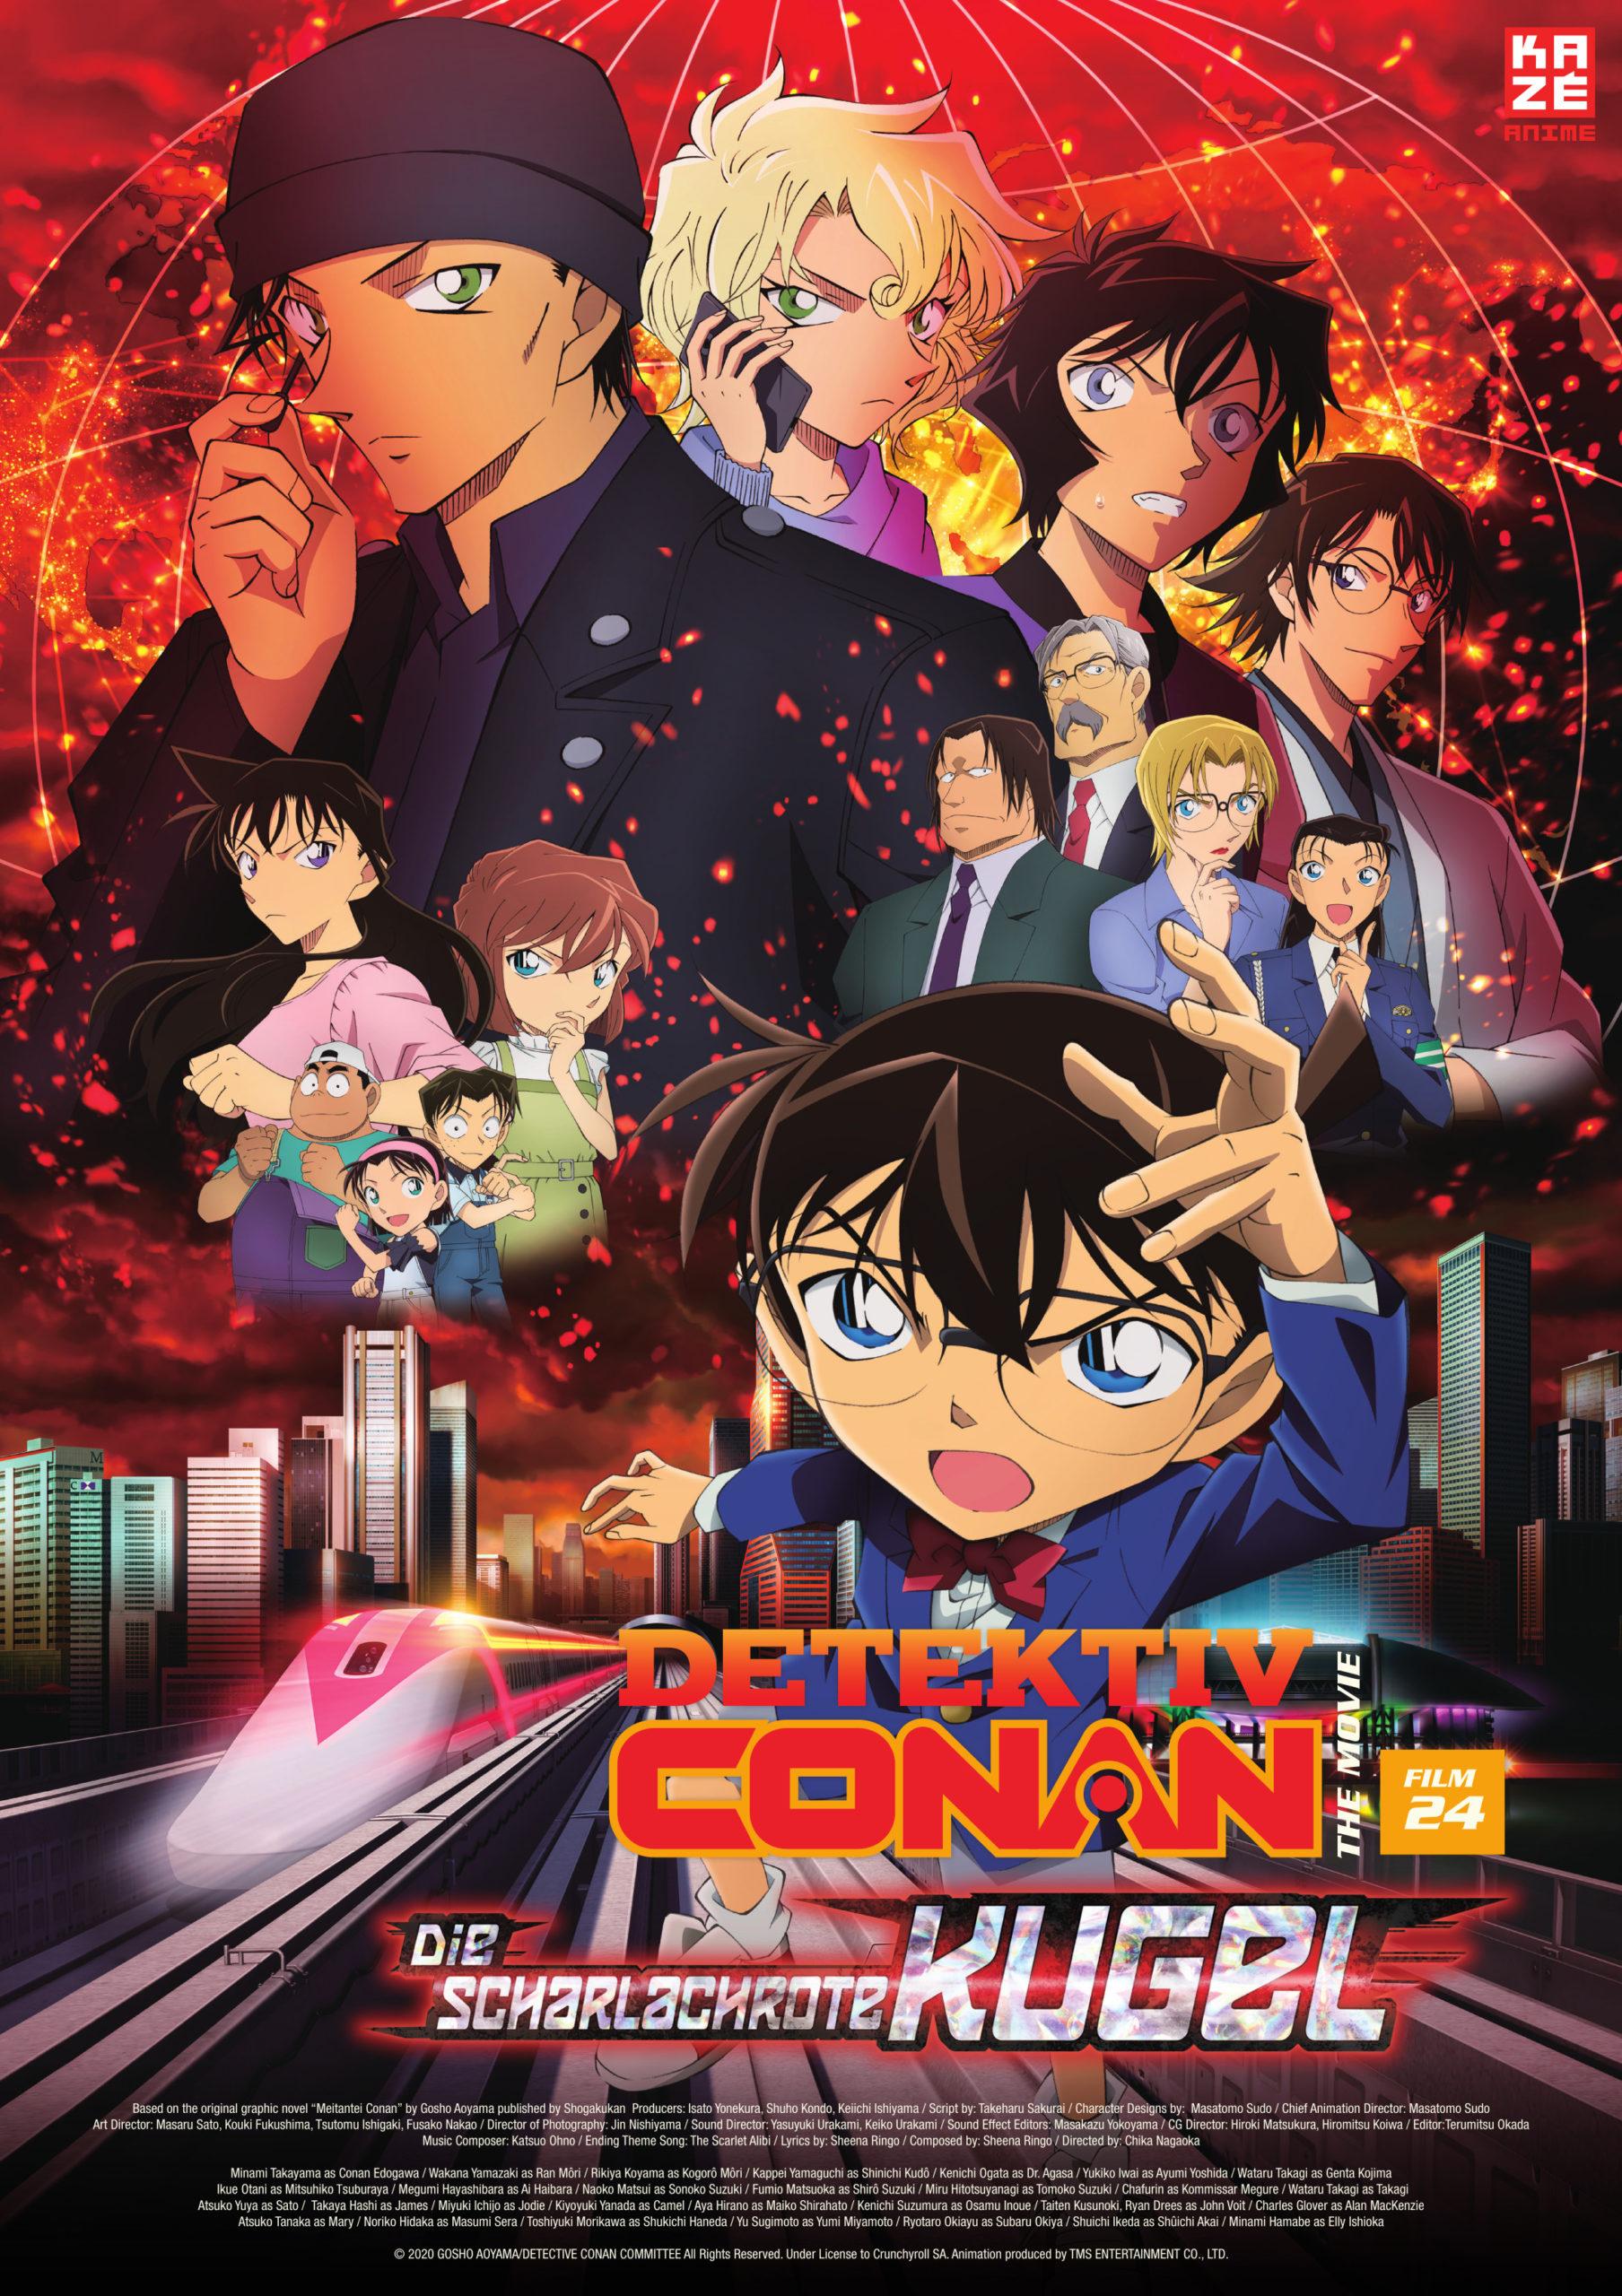 Detektiv Conan Film 24 verschoben